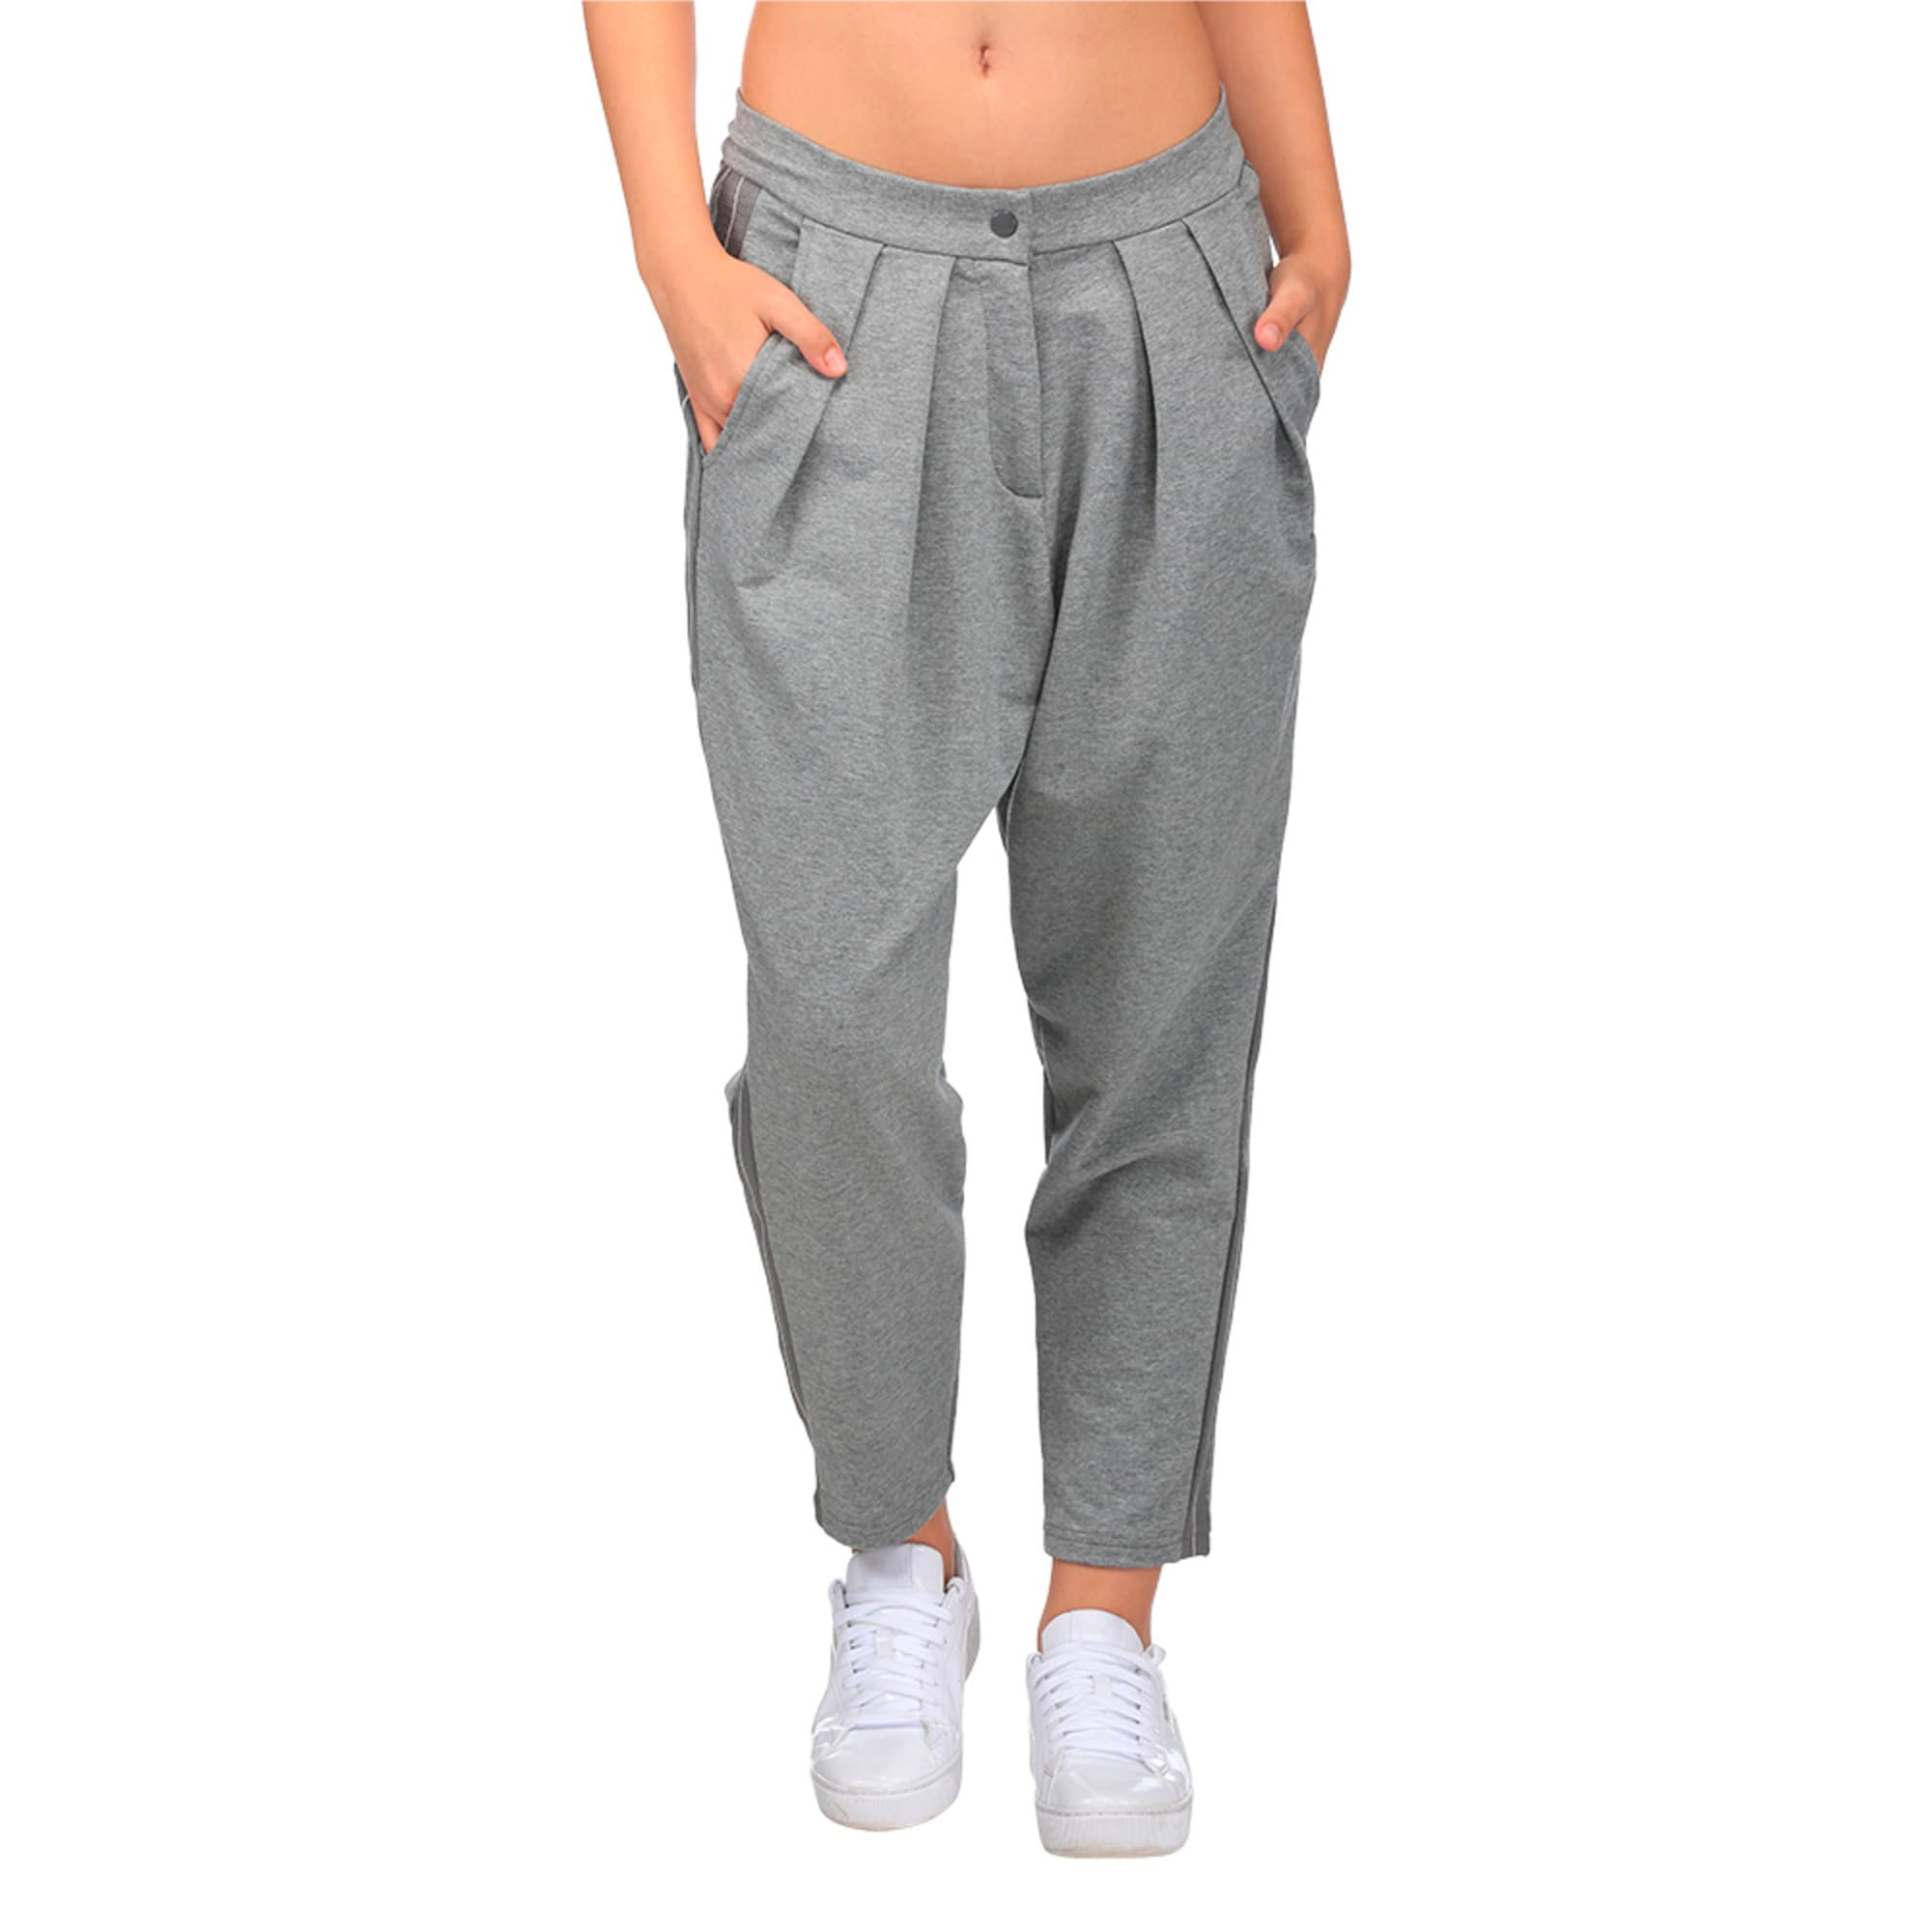 Thumbnail 1 of Evolution Women's Tape High Waist Sweatpants, Medium Gray Heather, medium-IND